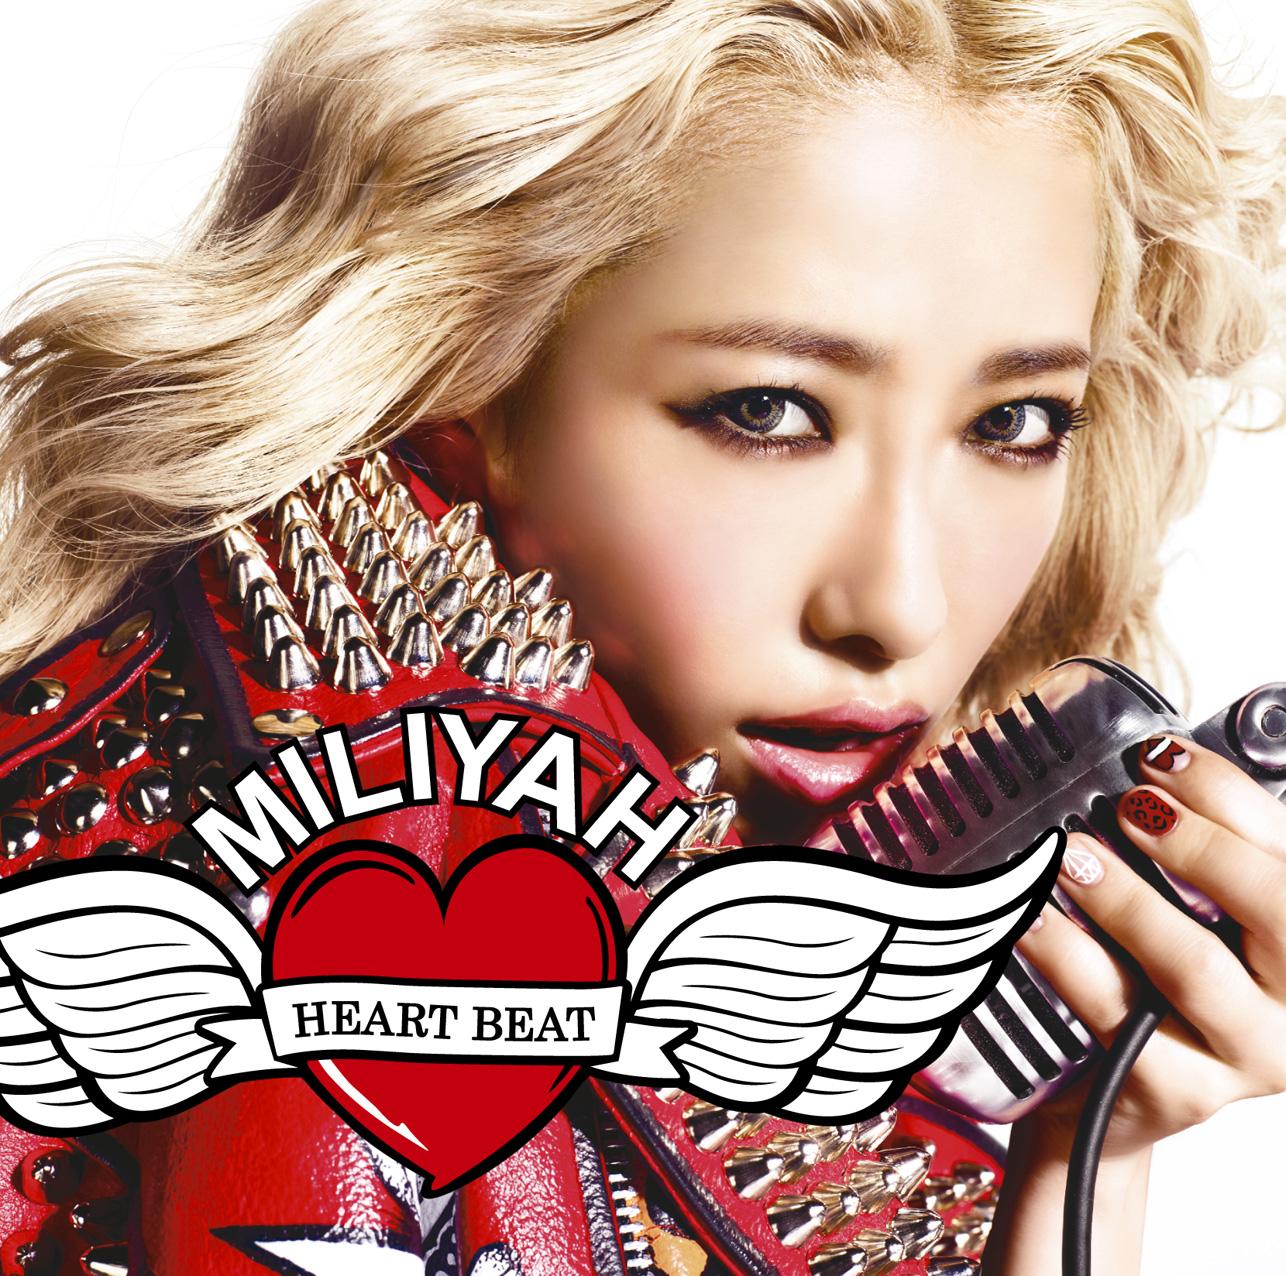 20161015.01.09 Miliyah Kato - Heart Beat cover 1.jpg